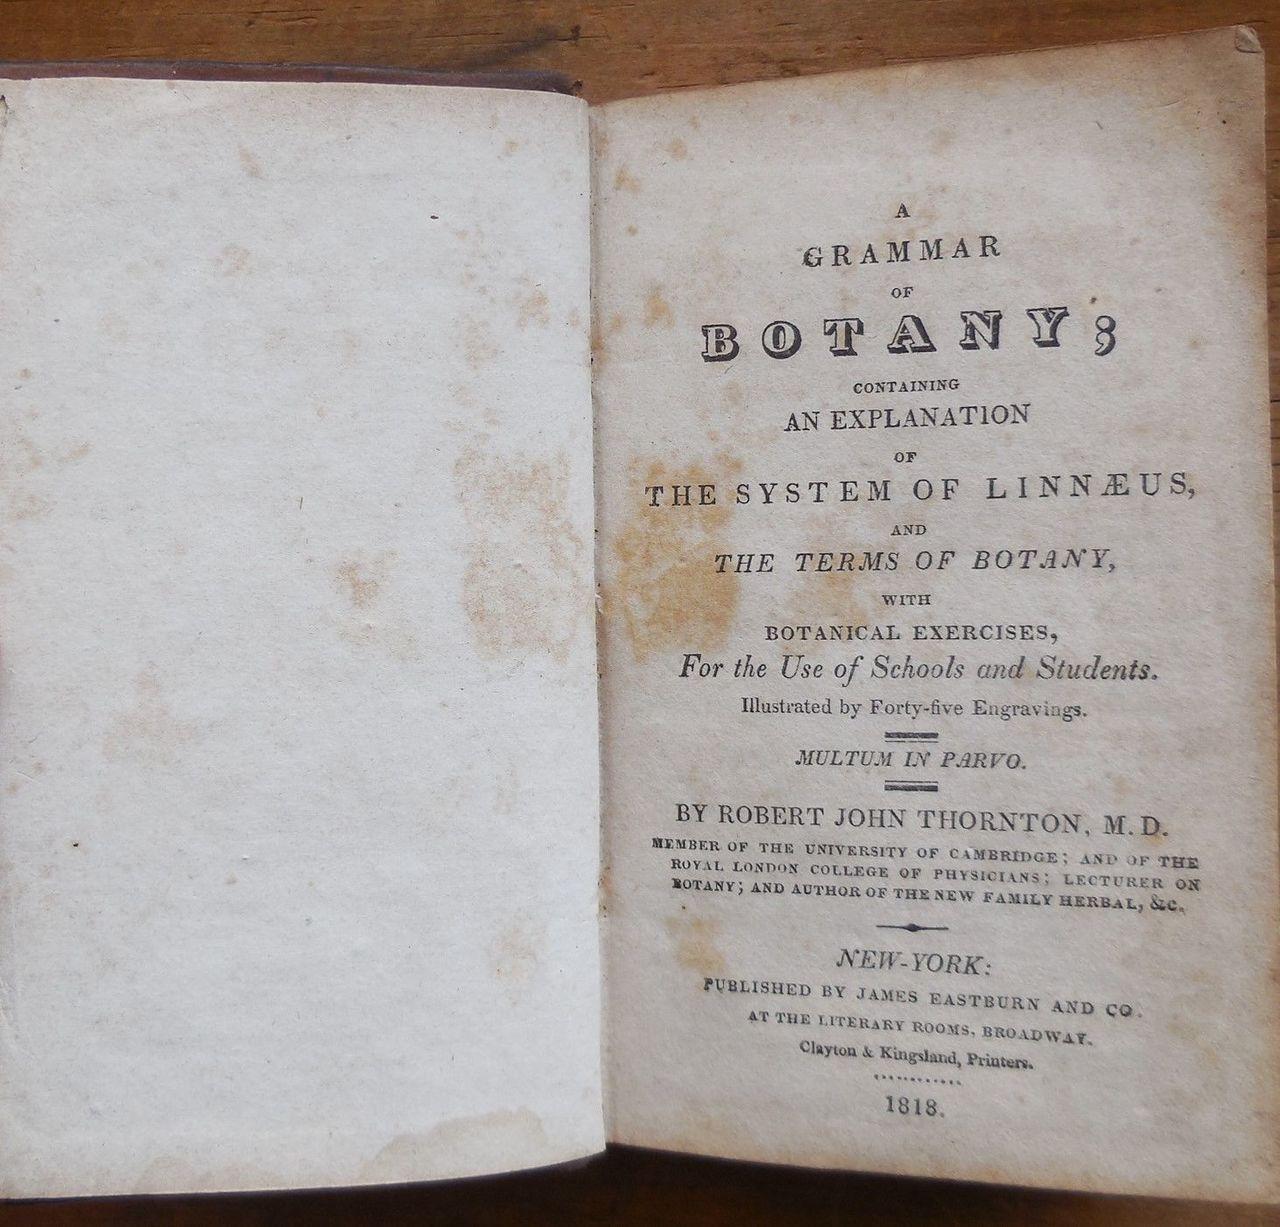 A GRAMMAR OF BOTANY, by Robert John Thornton - 1818 Botanical Illustrations